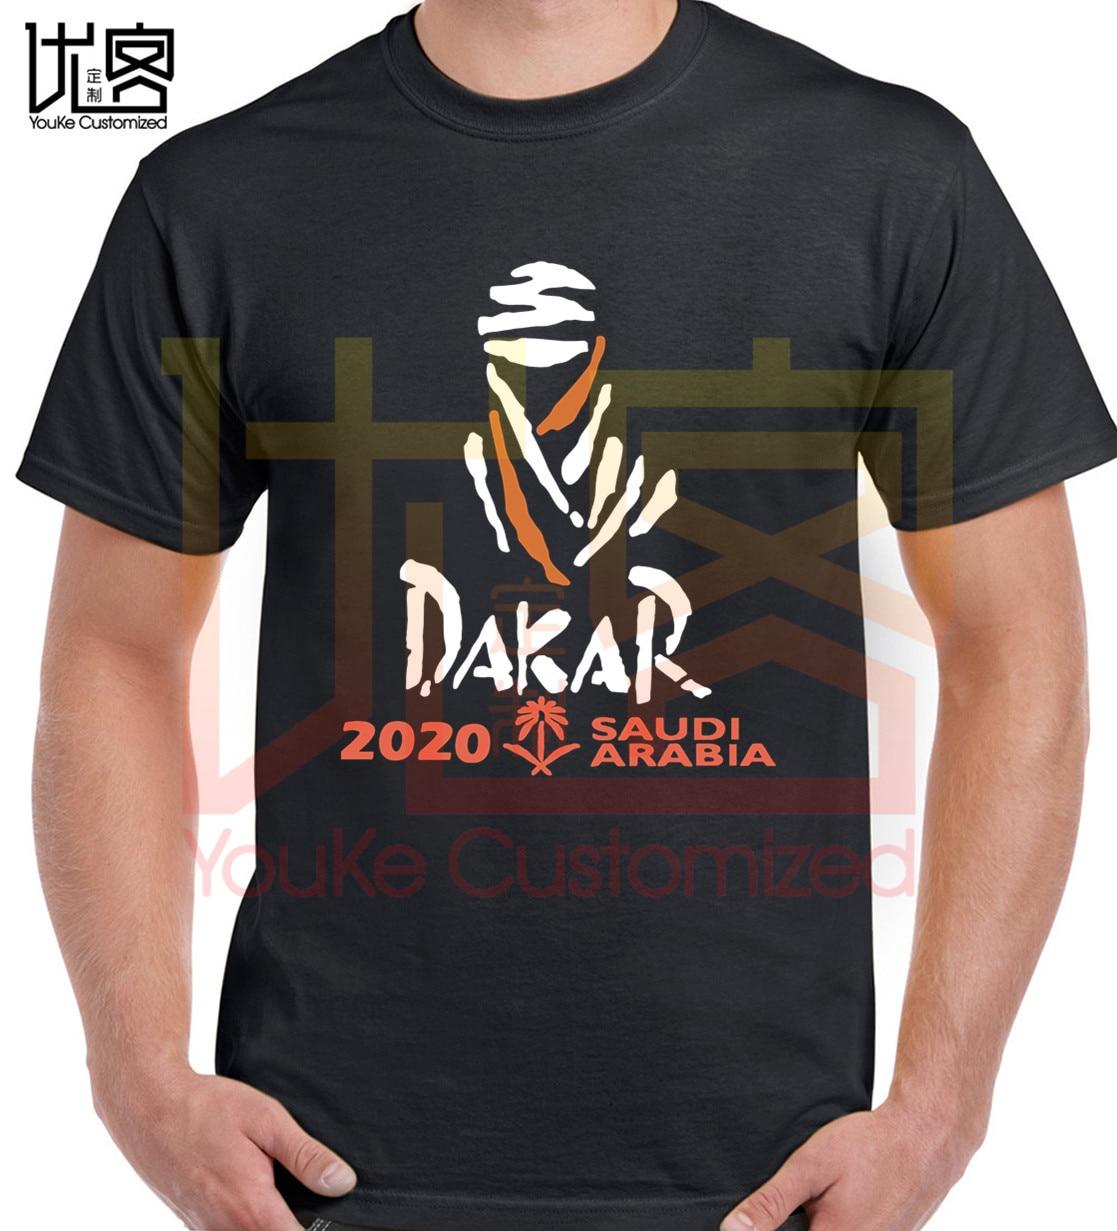 Dakar 2020 Rally Racing Saudi Logo T Shirt Men's Women's Fashion O-neck Cotton Short Sleeves Tops Tee Printed Unisex T-shirt